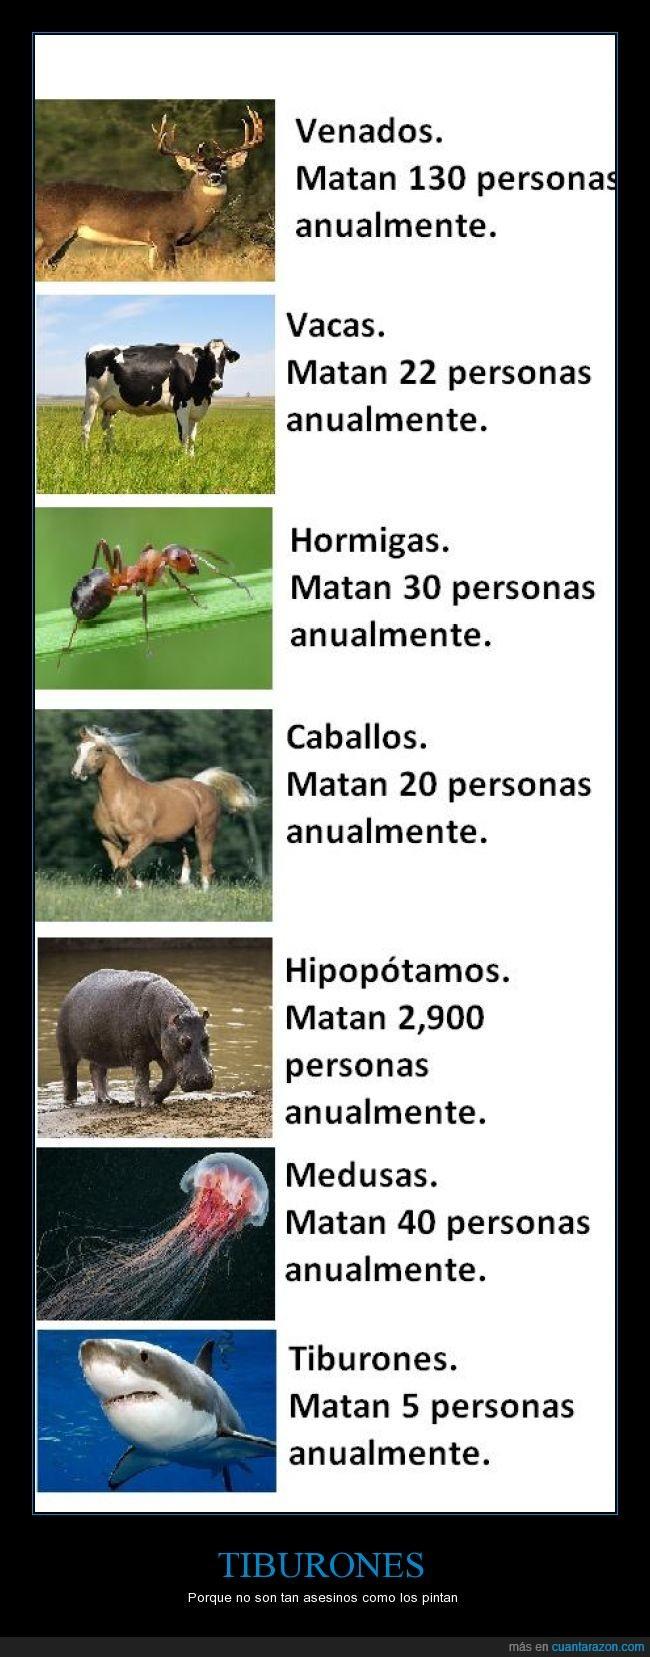 animales,caballo,hipopotamo,hormiga,matar,medusa,tiburon,vaca,venado,victima